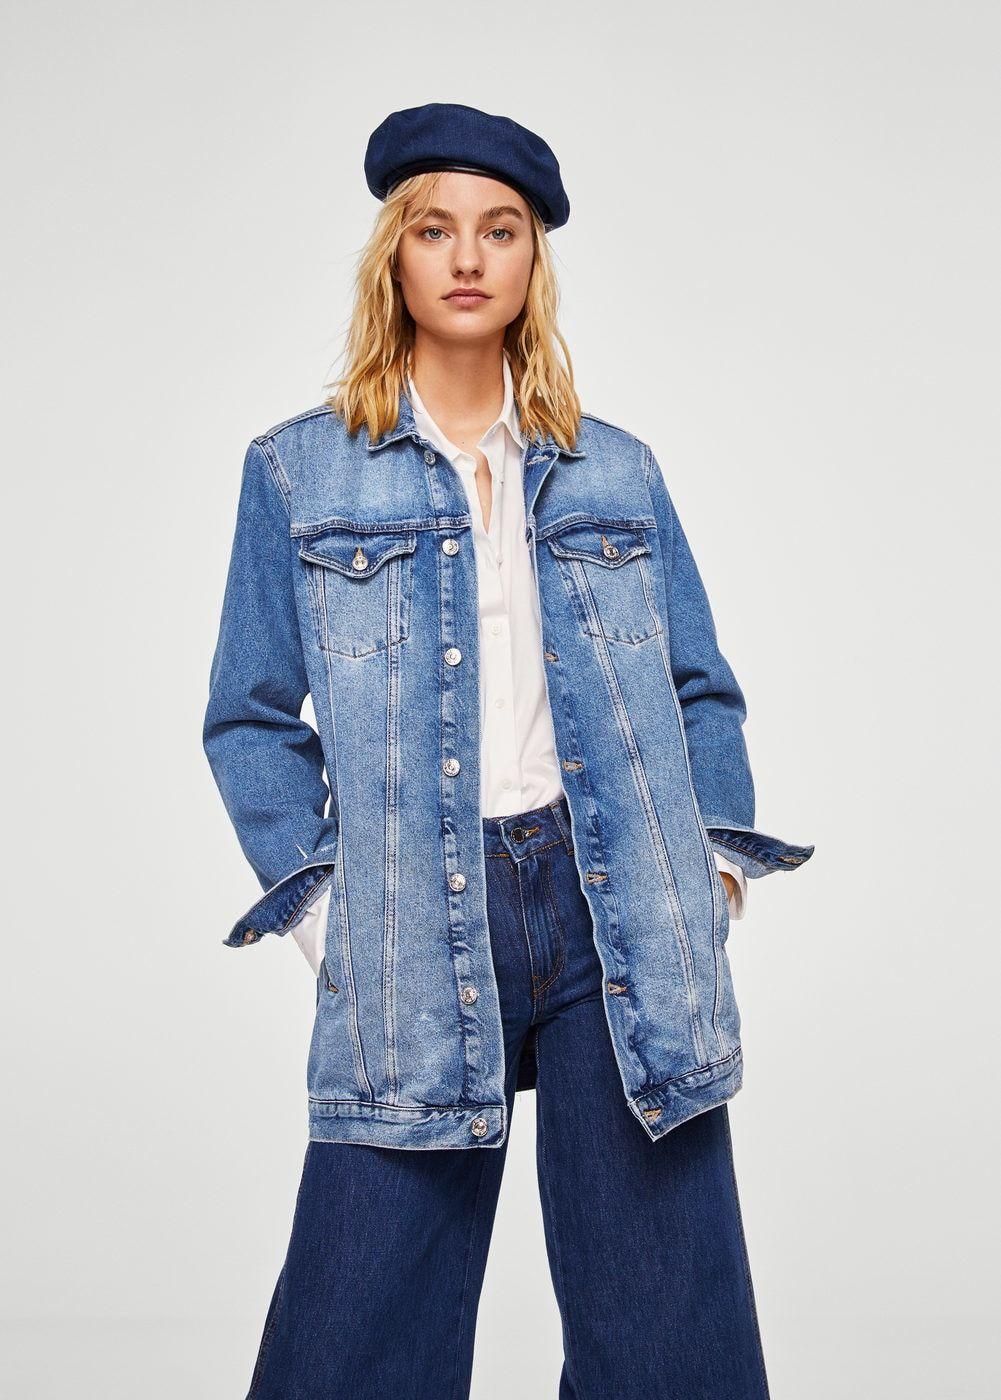 Jackets In Jacket Pinterest Denim 2018 Oversize Women PqAxAT